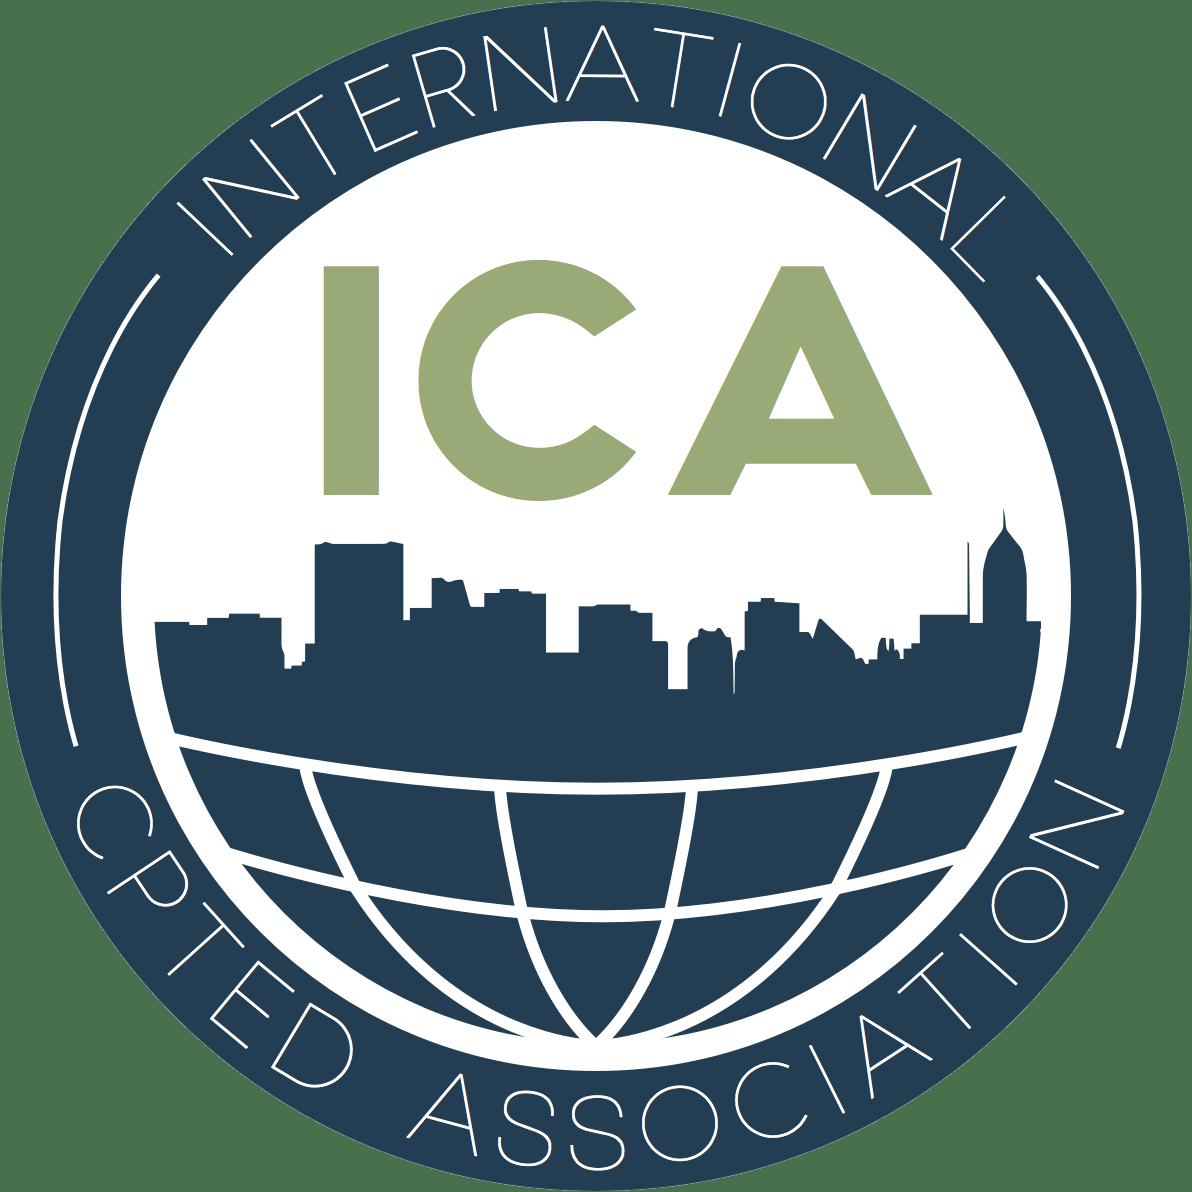 Seal for International Crime Prevention Through Environmental Design Association